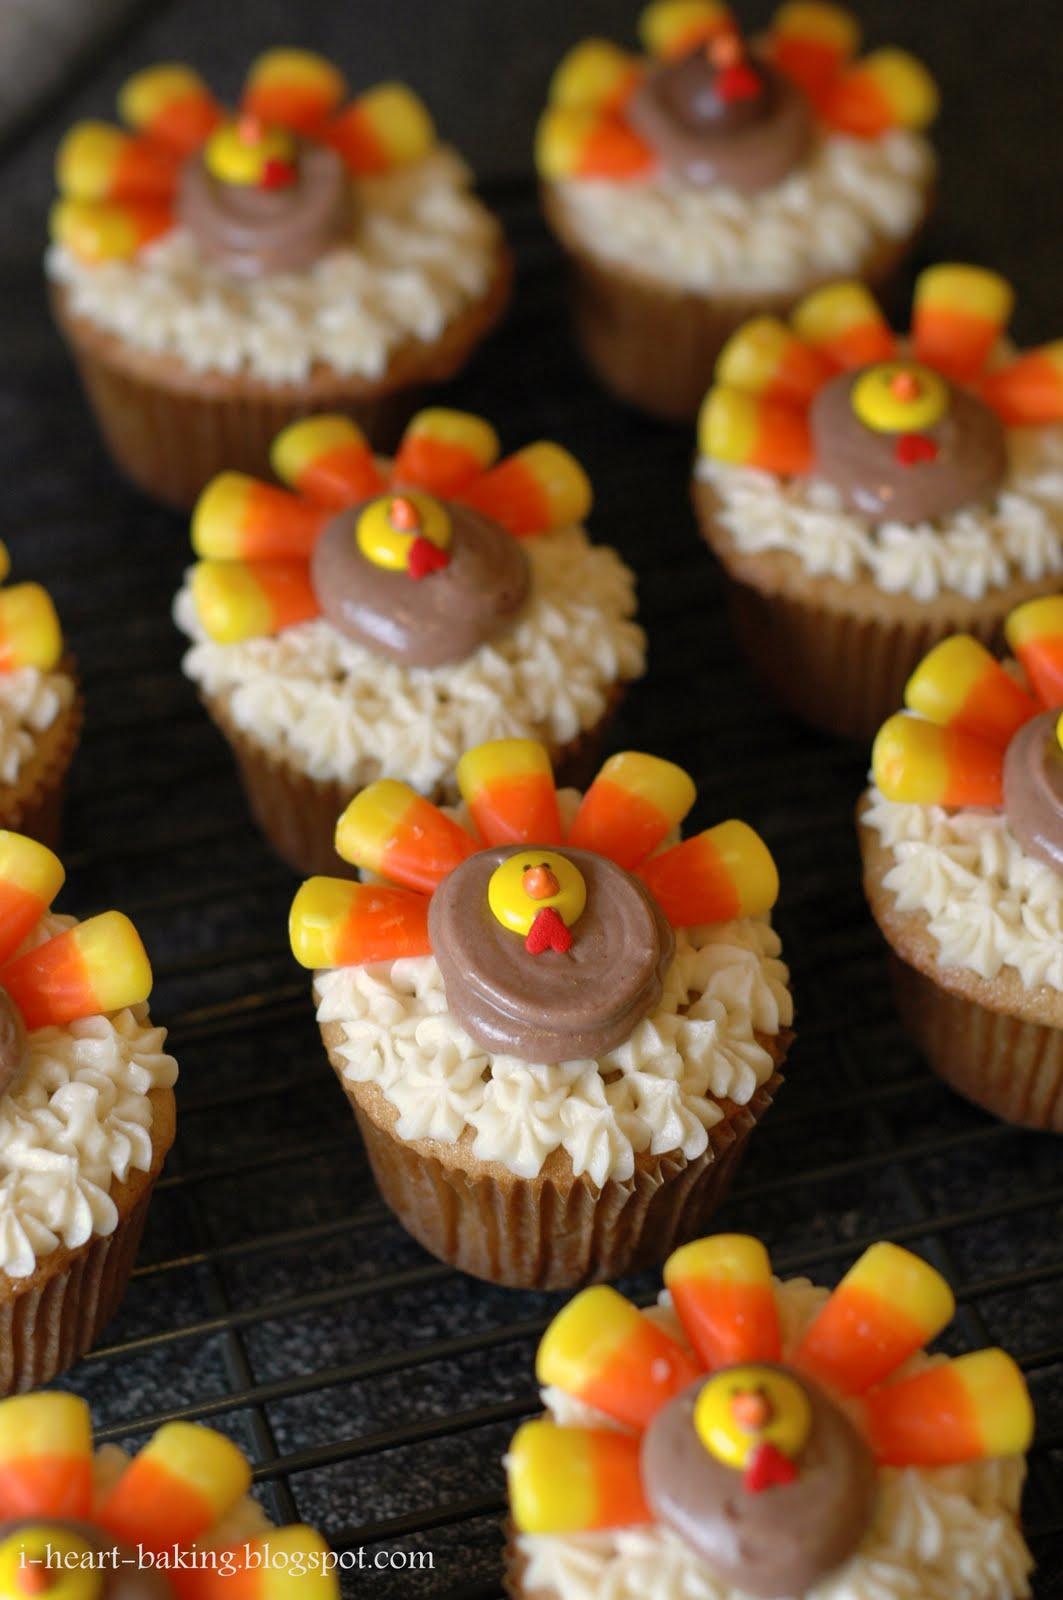 Heart Baking Thanksgiving Turkey Cupcakes Brown Sugar Pound Cakes